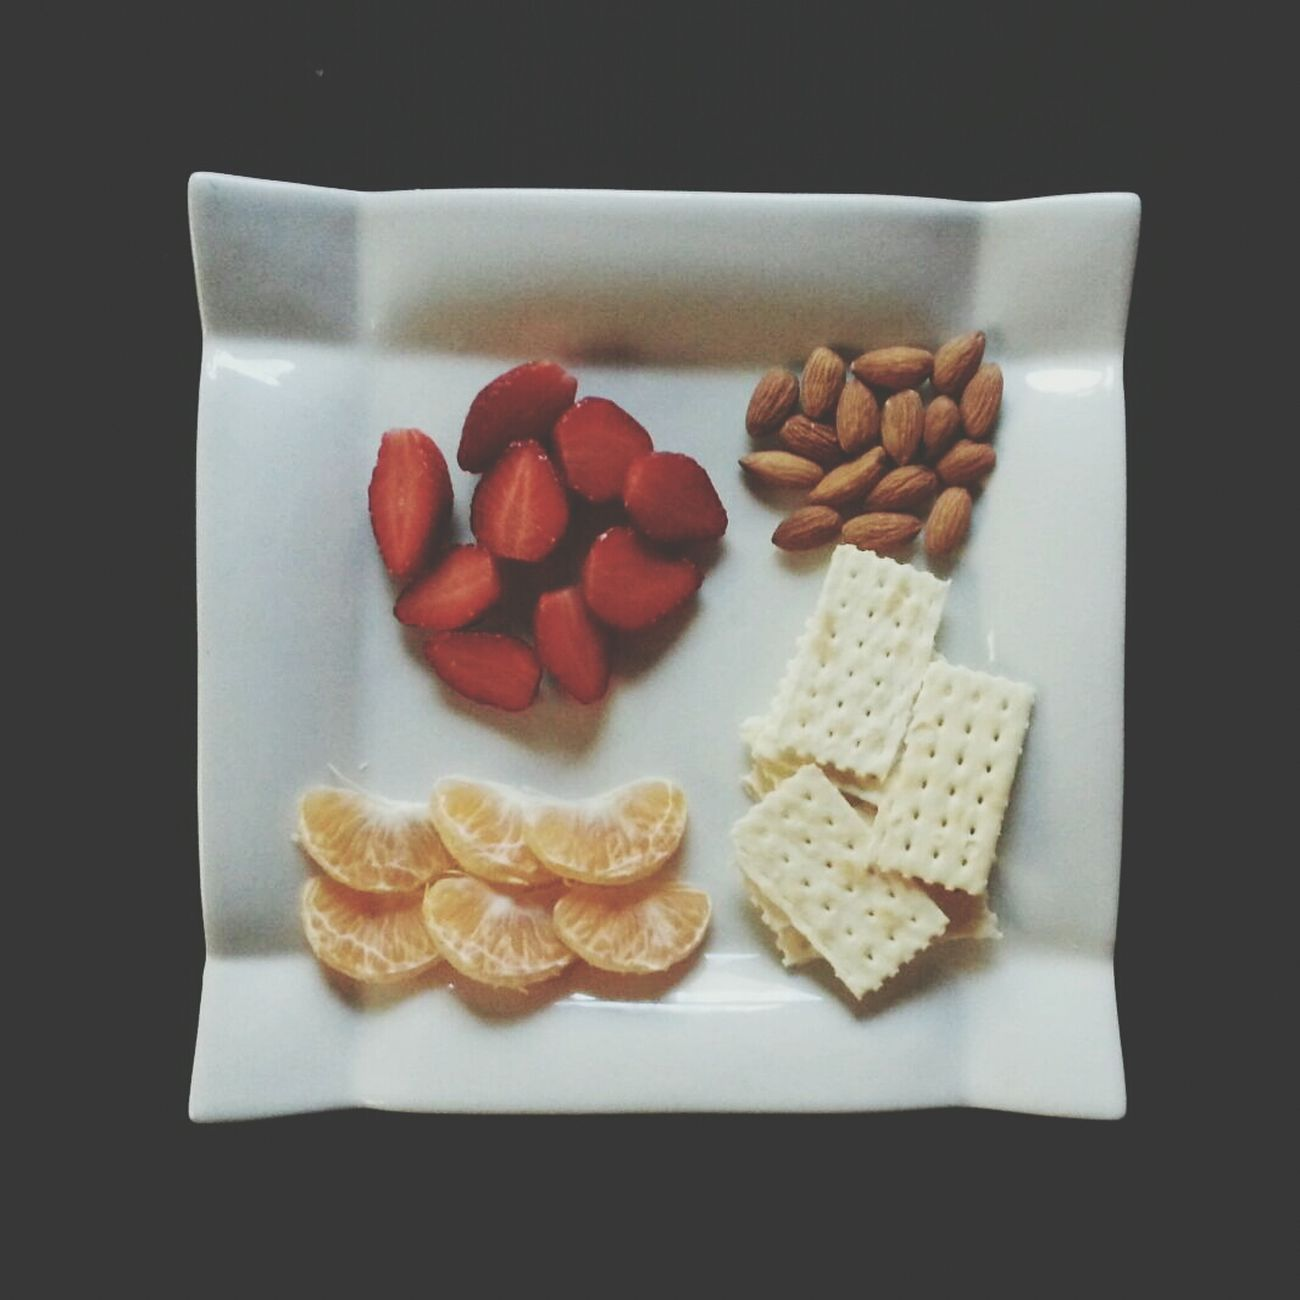 Healthy Snack Finally ♥